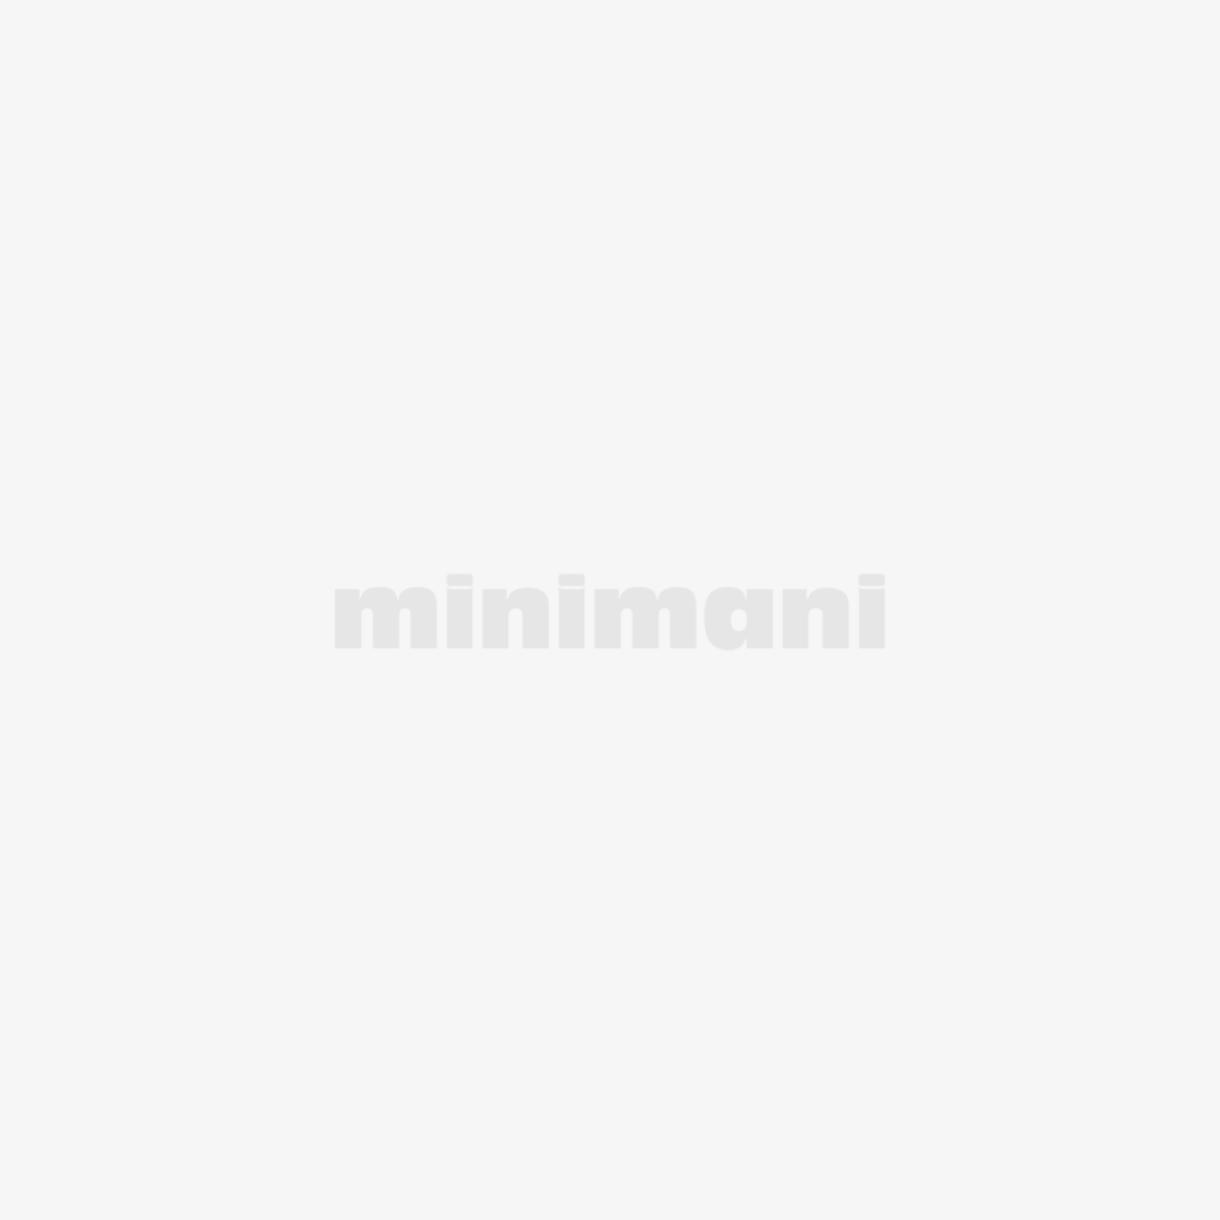 Vallila verhokappa 60x250cm, Aurajoki ocra